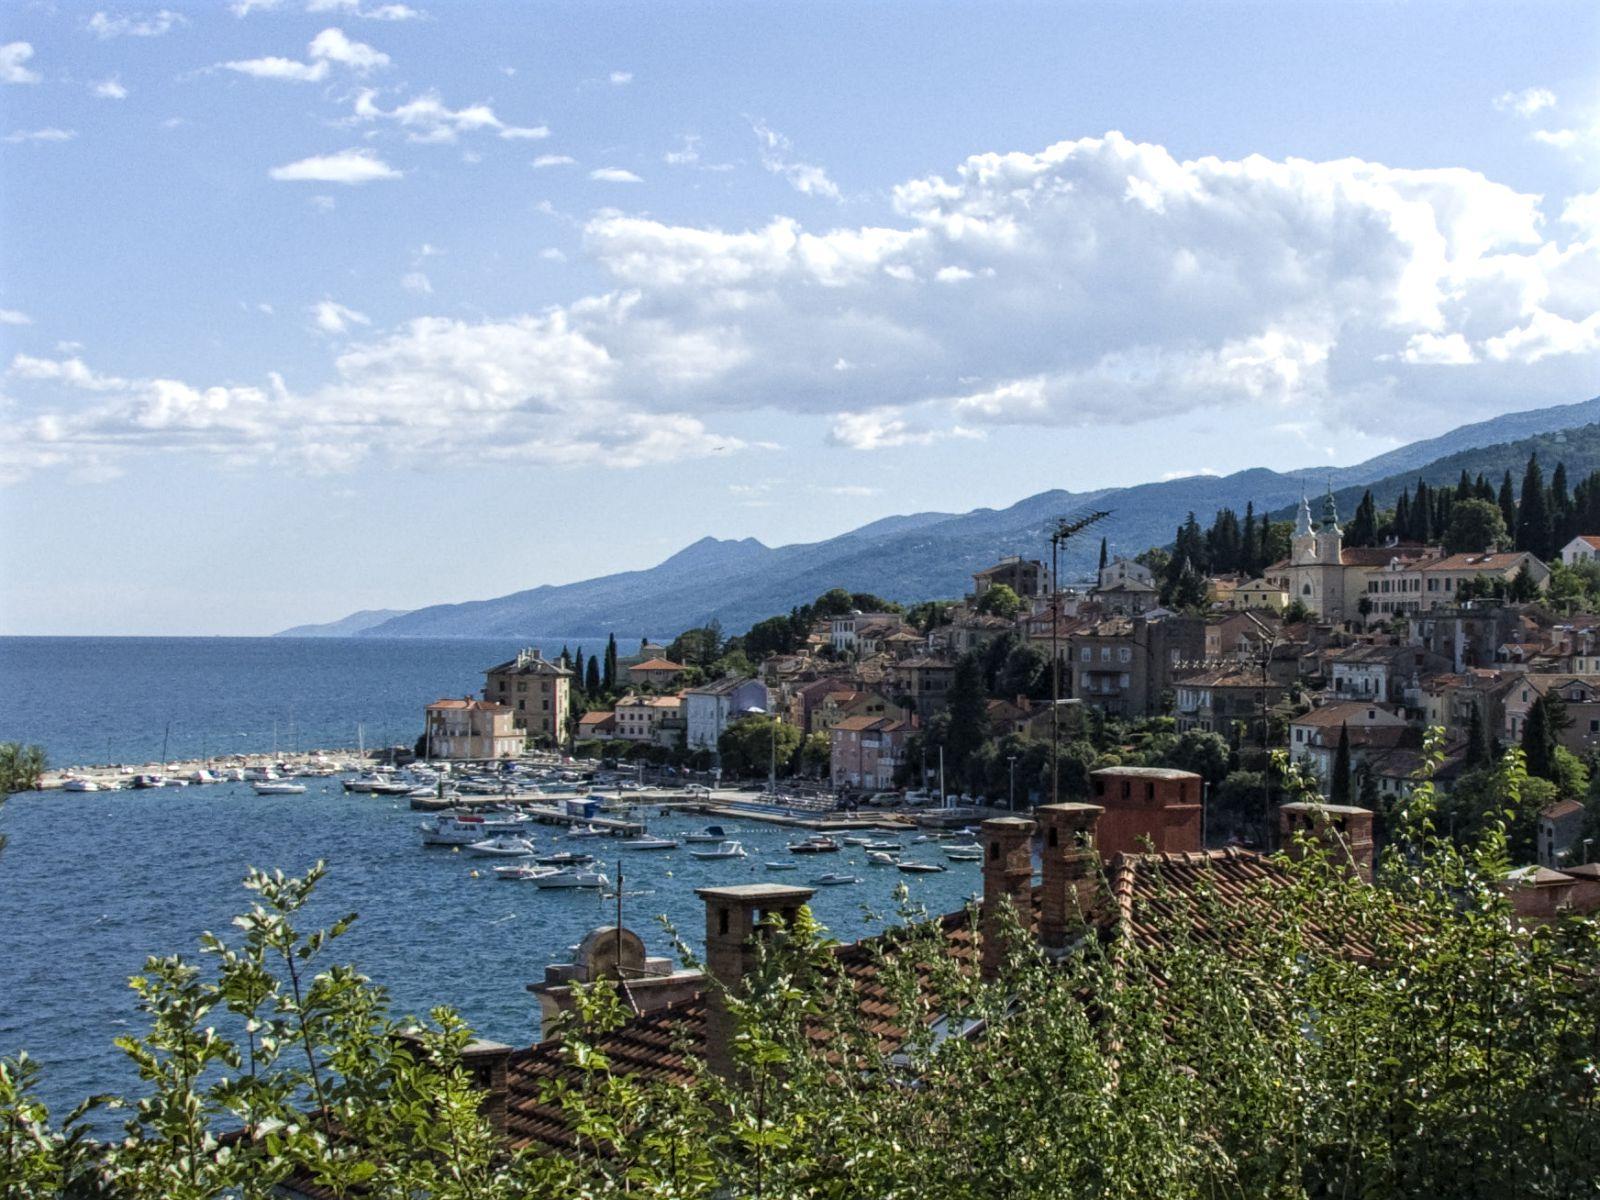 Wandering across Croatia